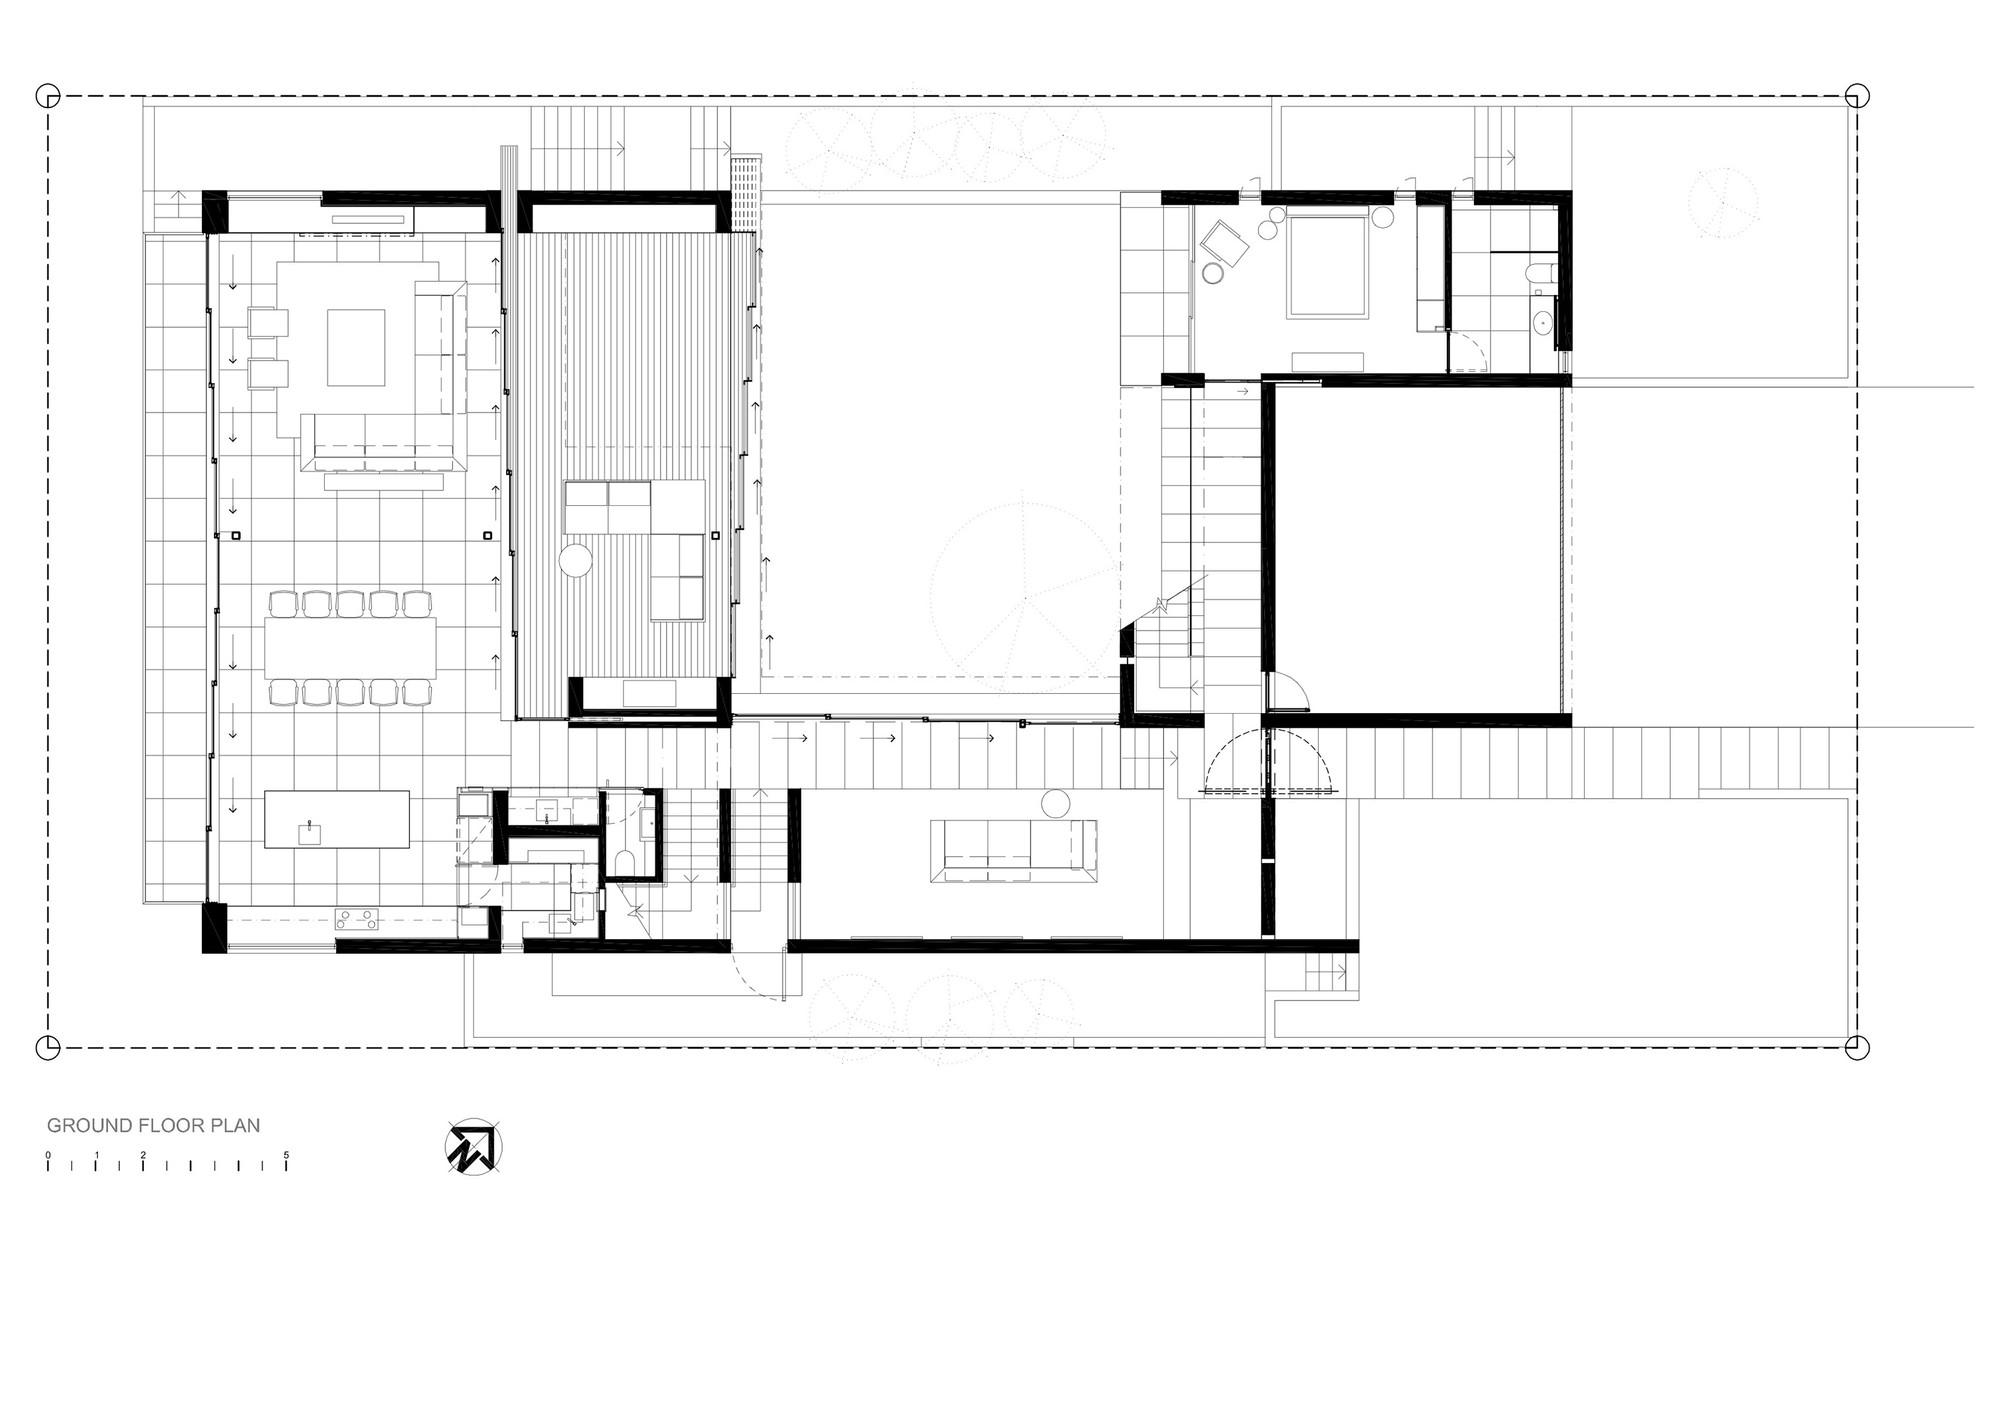 gallery of pearl bay residence gavin maddock design studio 26 pearl bay residence gavin maddock design studio 26 27 ground floor plan